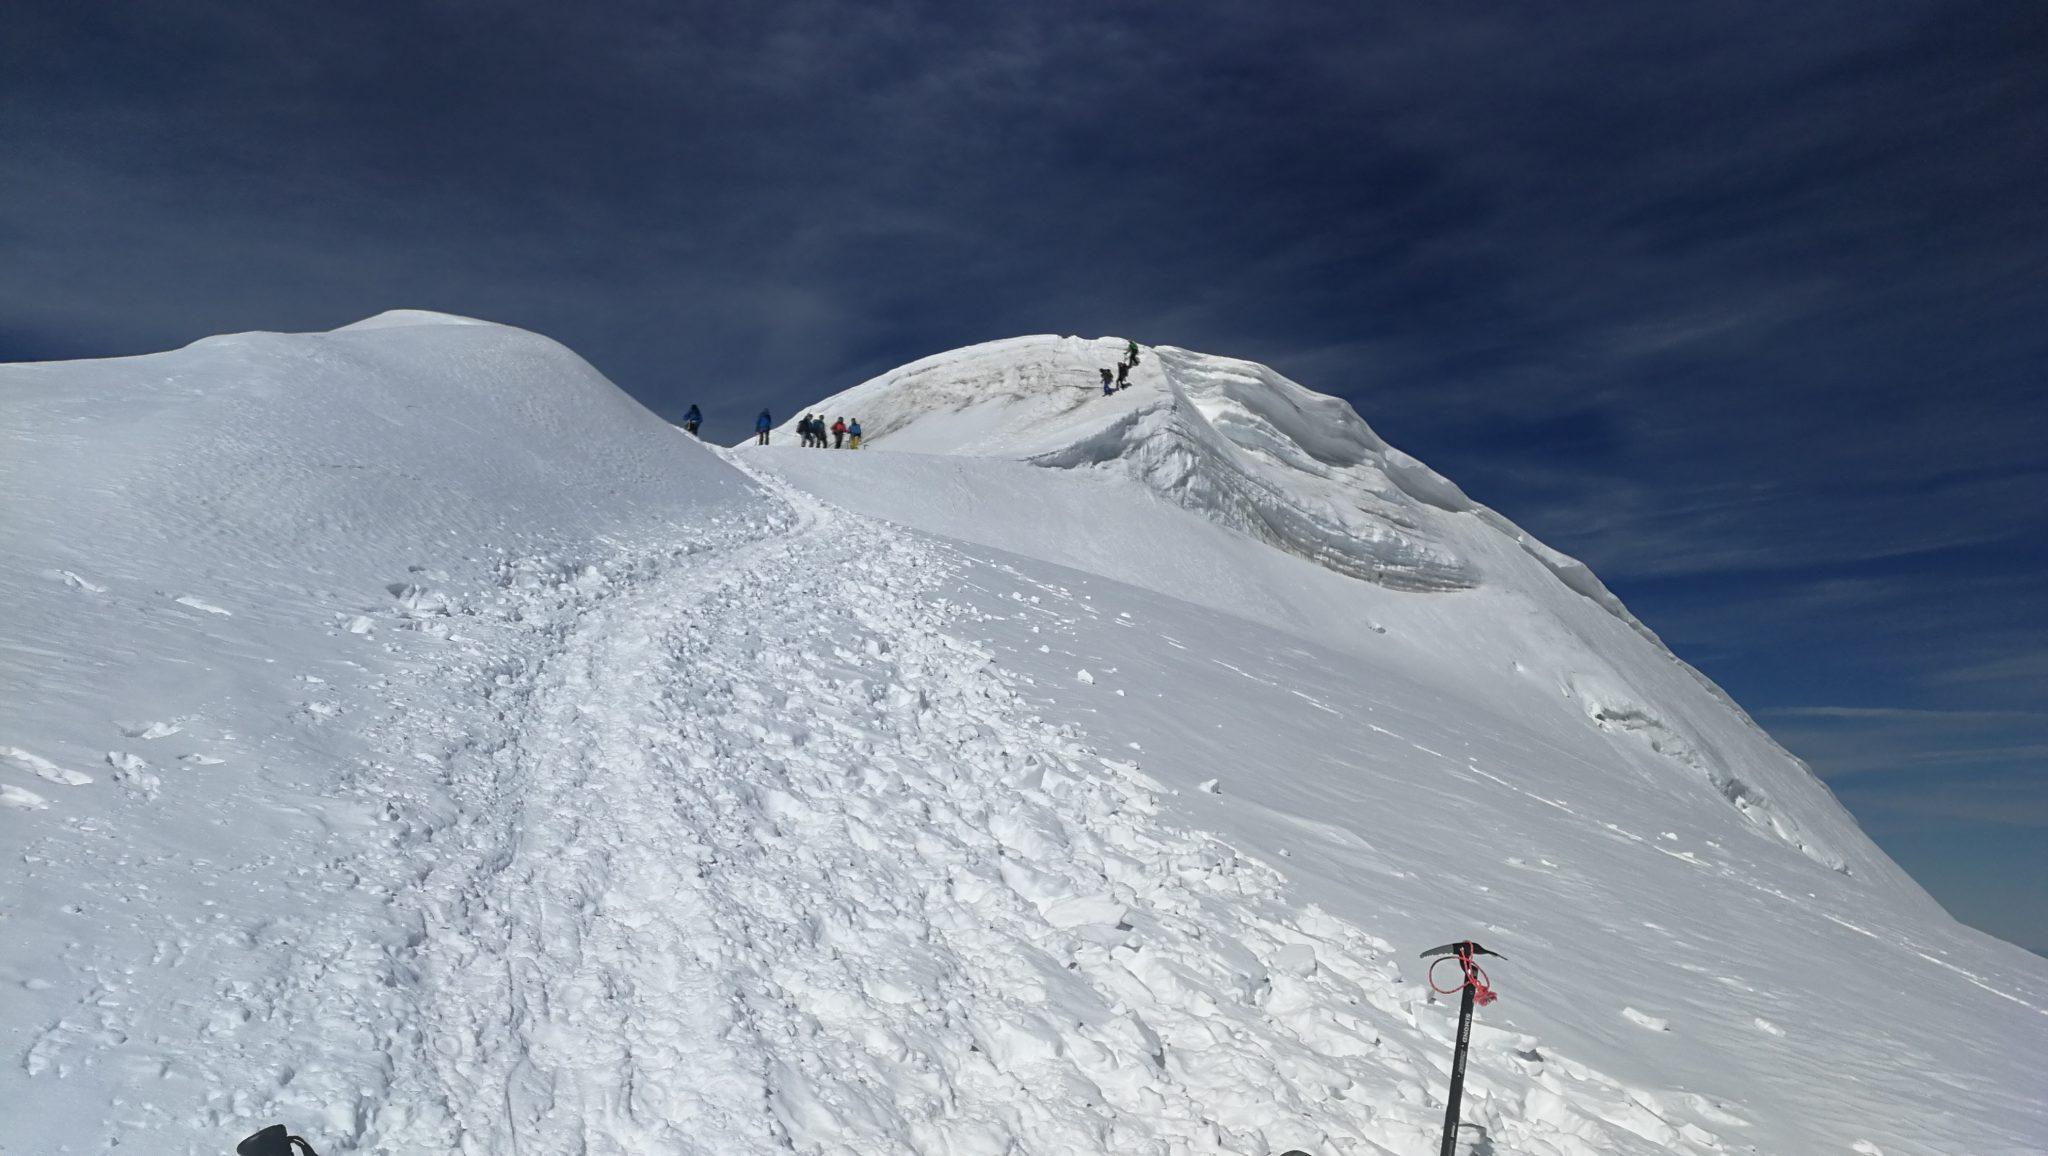 Widok na szczyt Bishornu